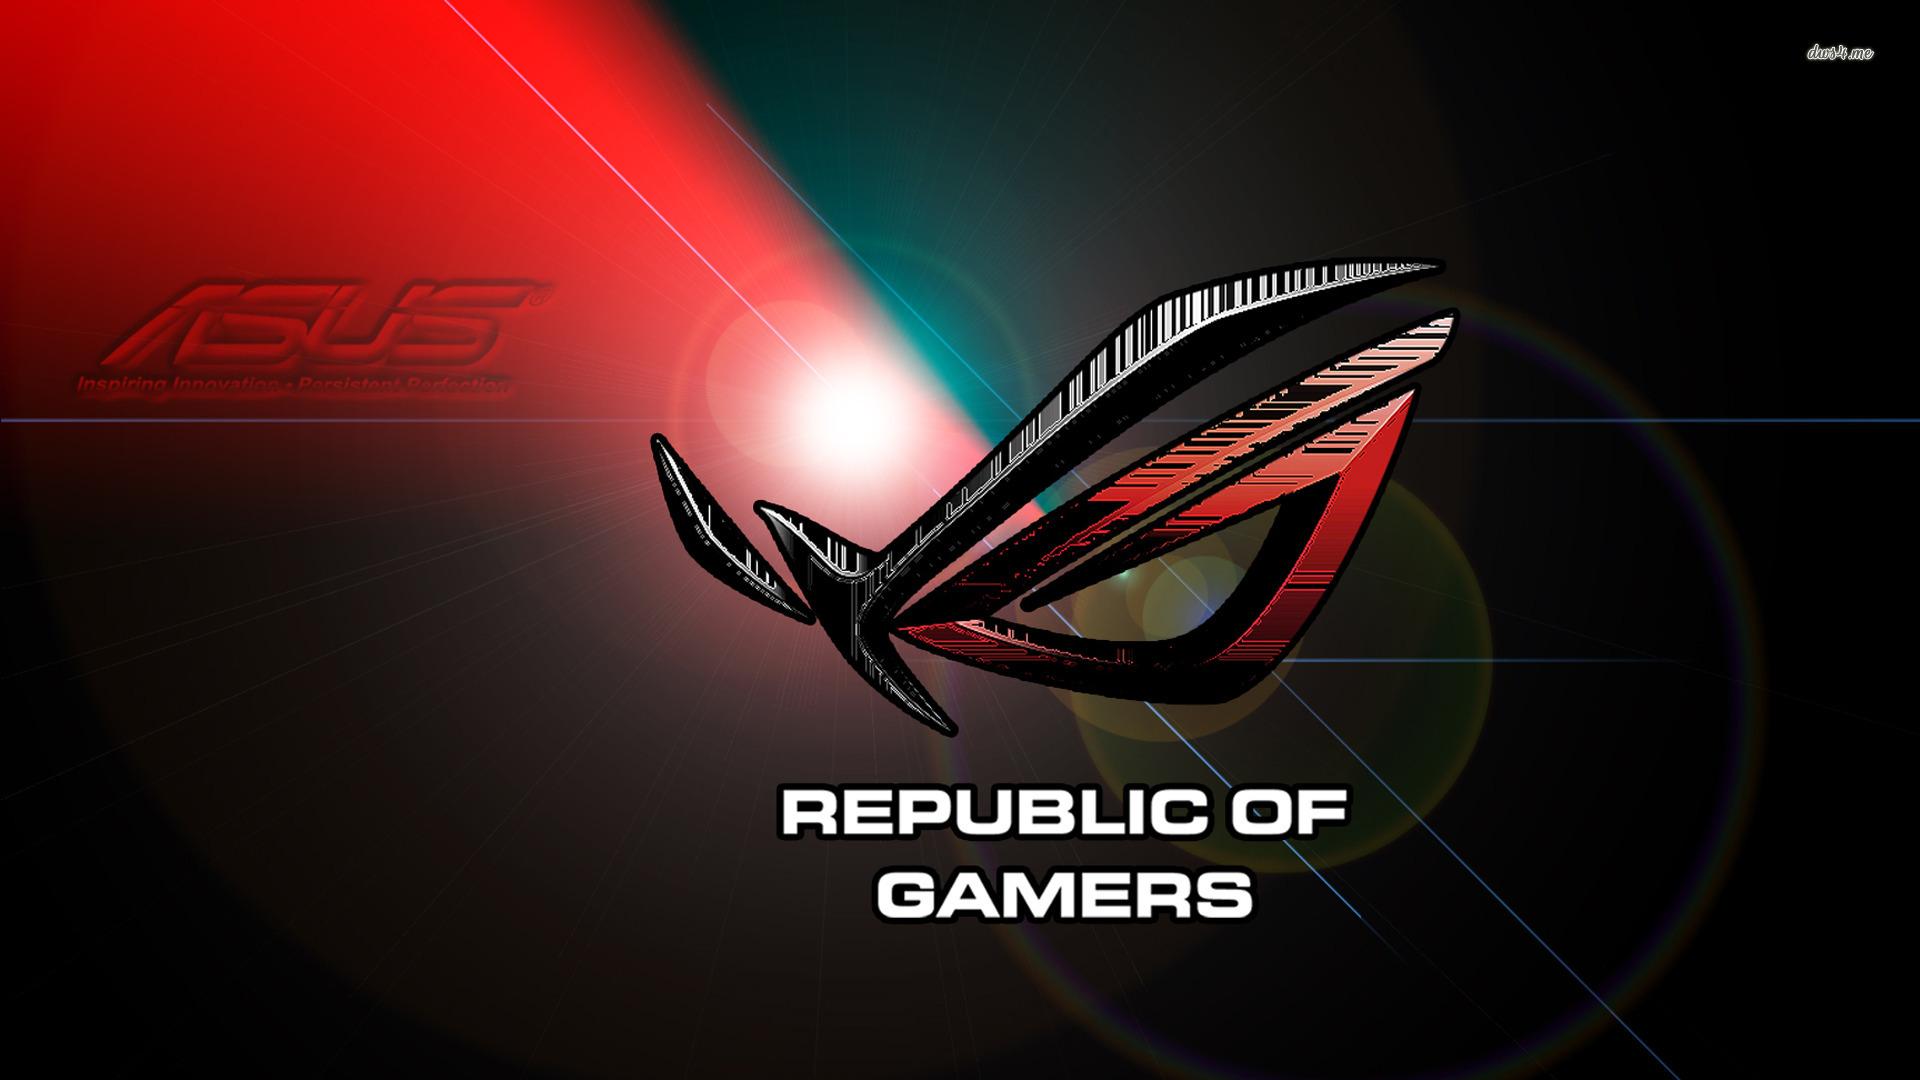 republic of gamers wallpaper HD 1920x1080